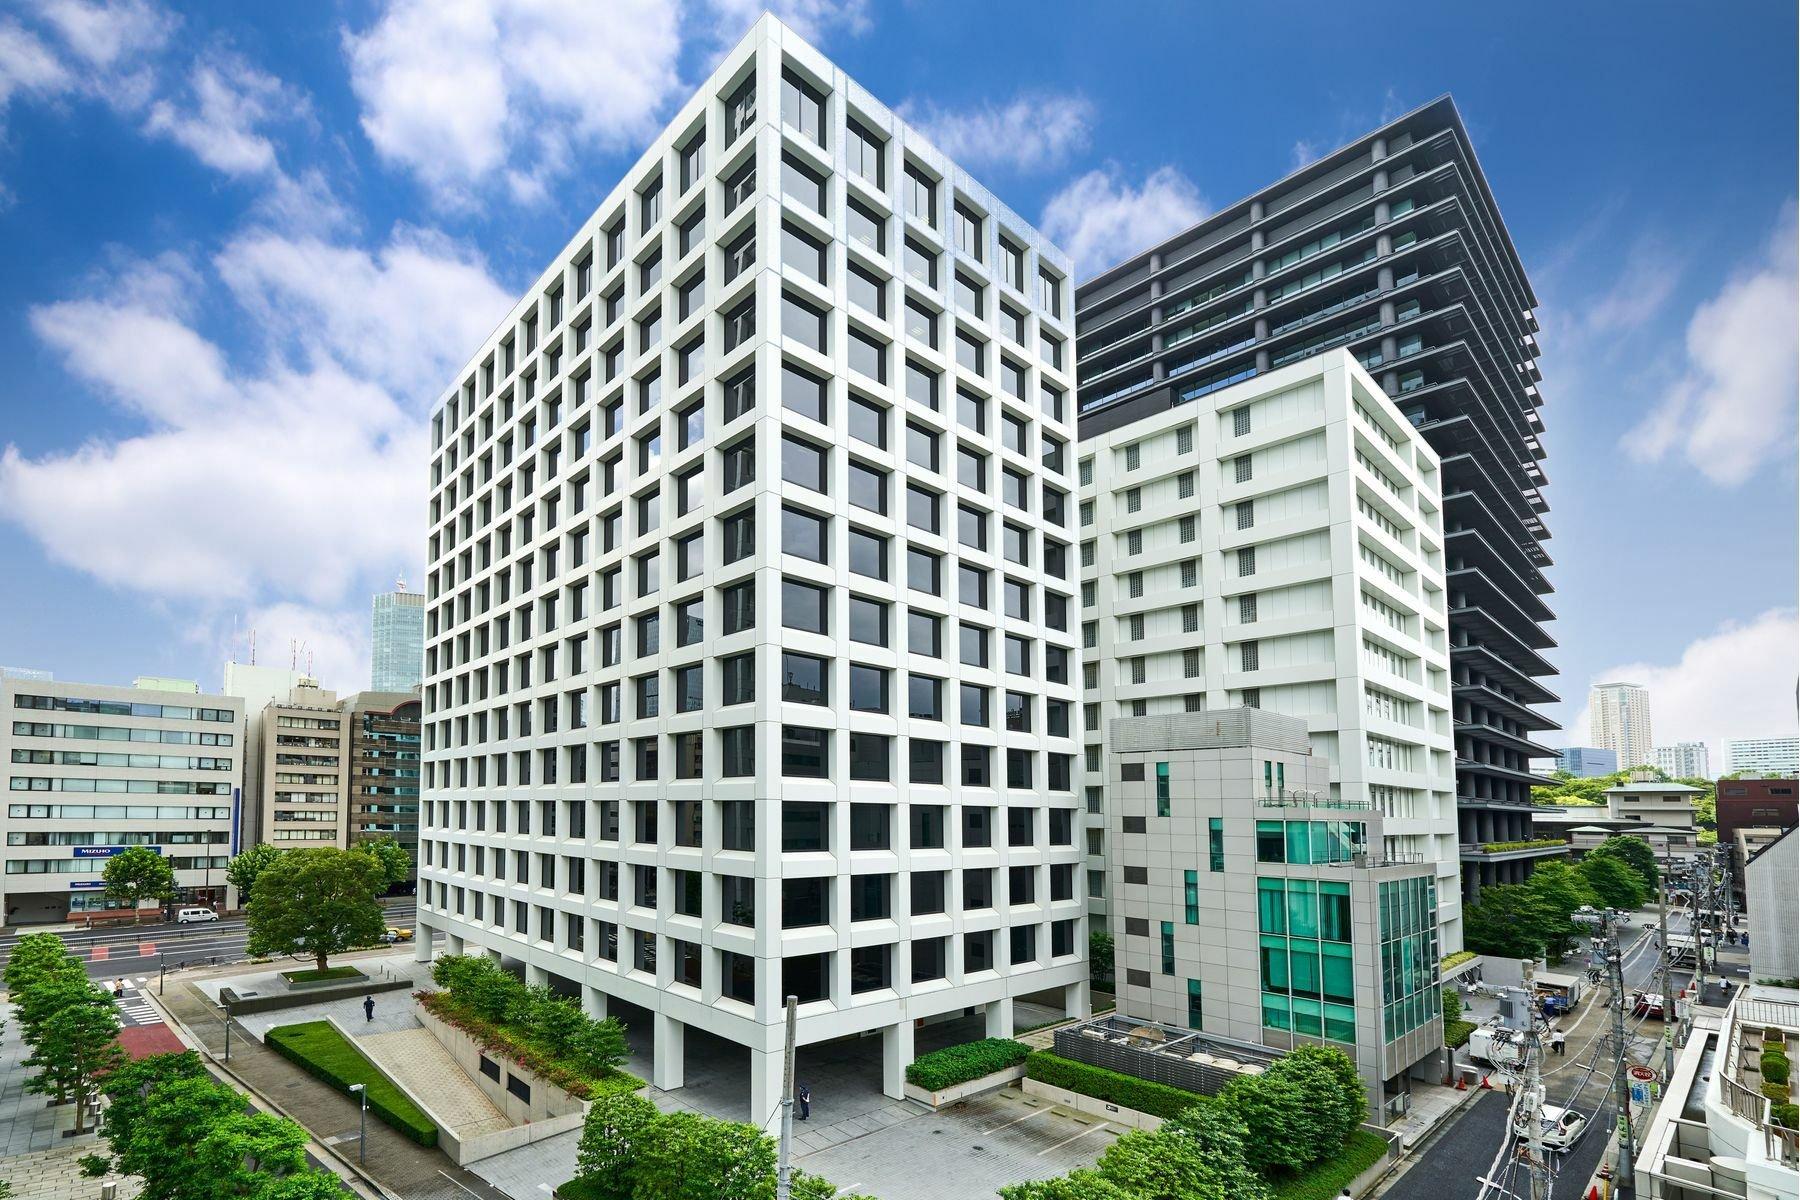 Condo in Minato City, Tokyo, Japan 1